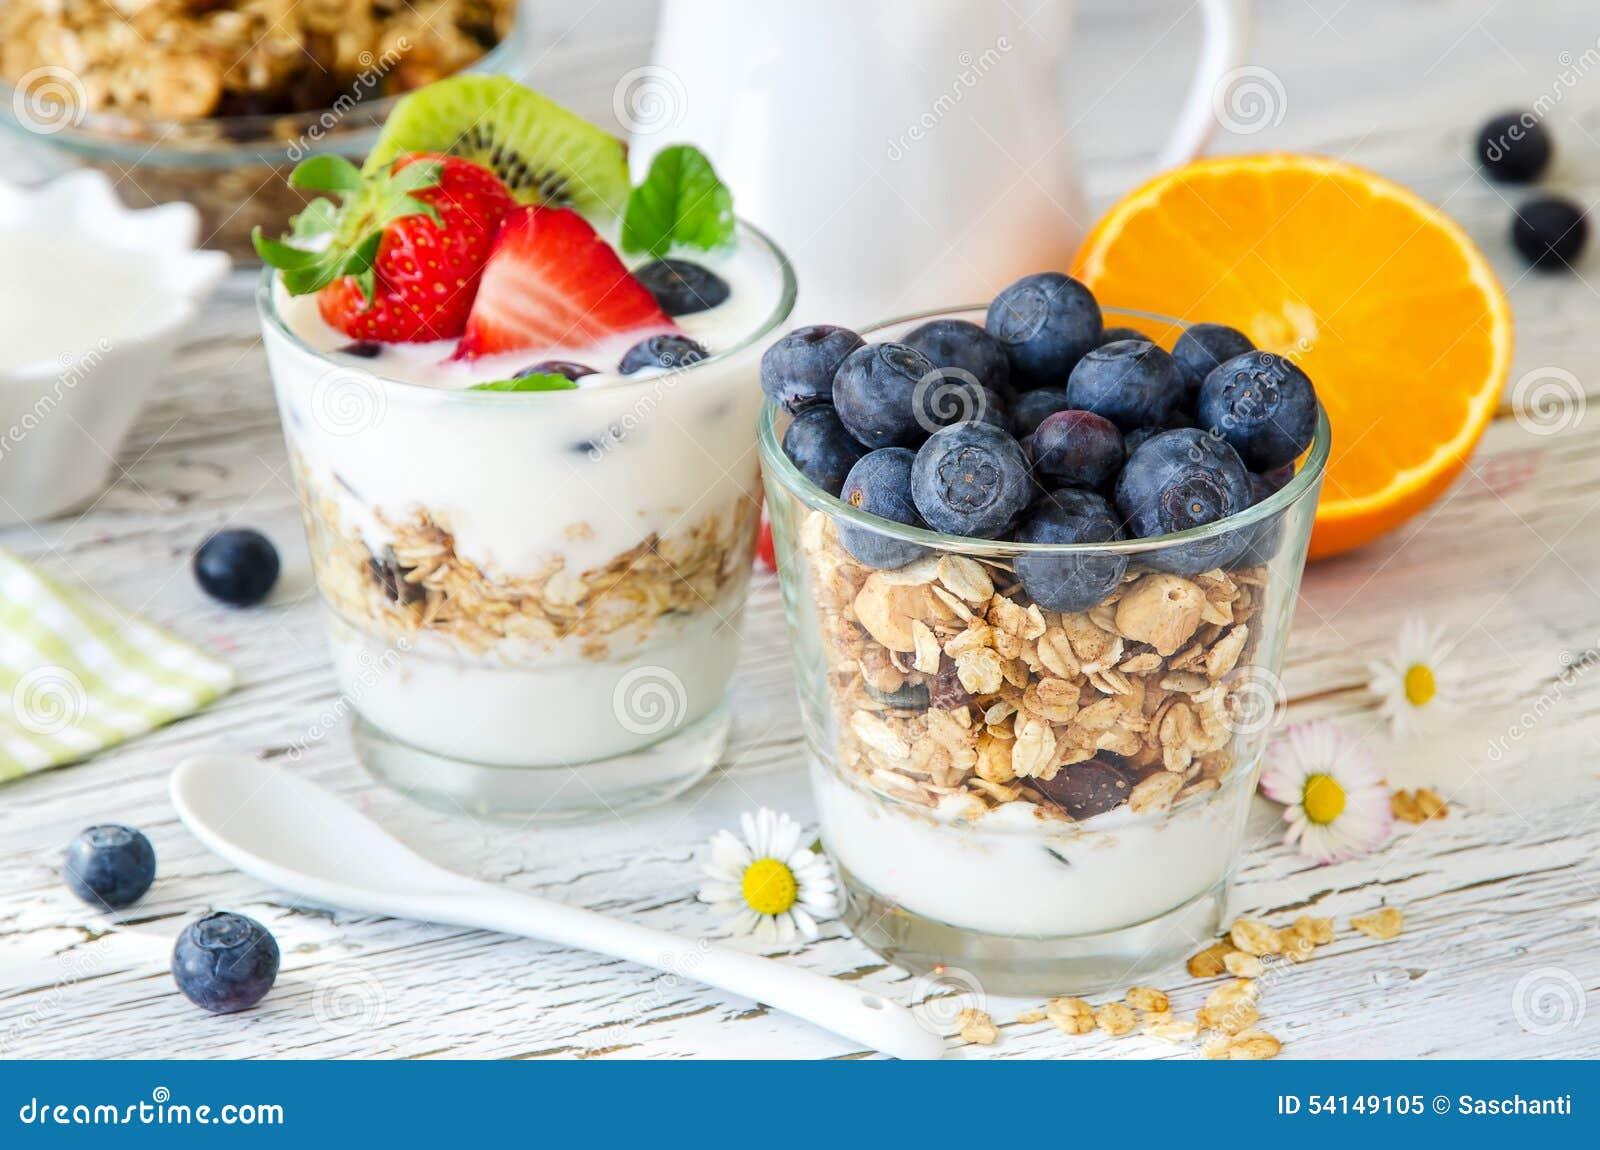 Muesli Yogurt Bowl